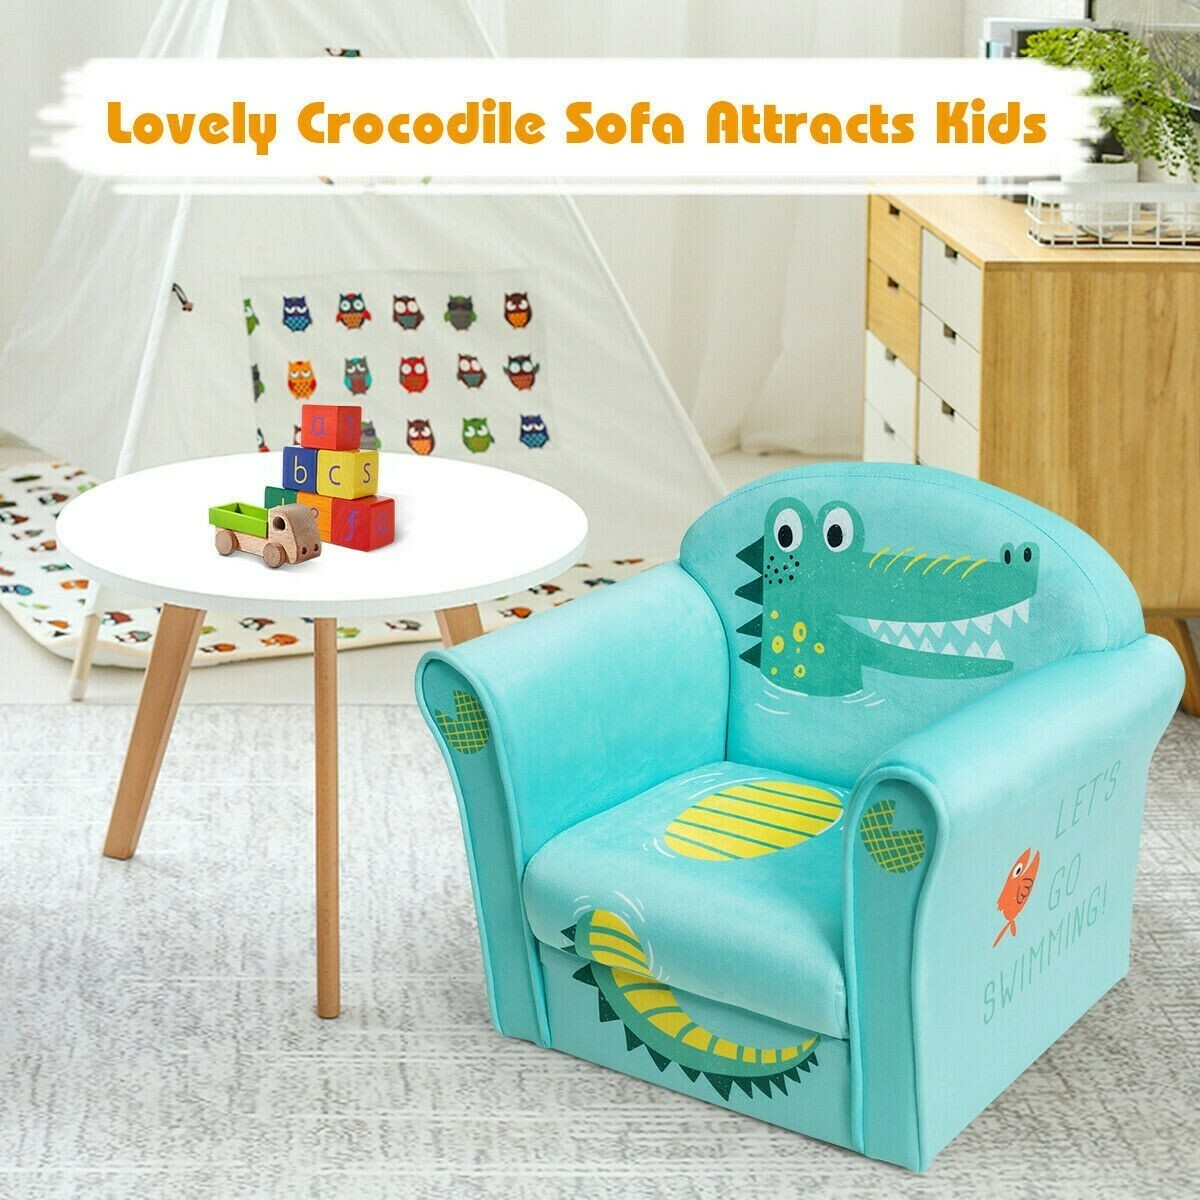 Kids Sofa Crocodile Armrest Upholstered Couch